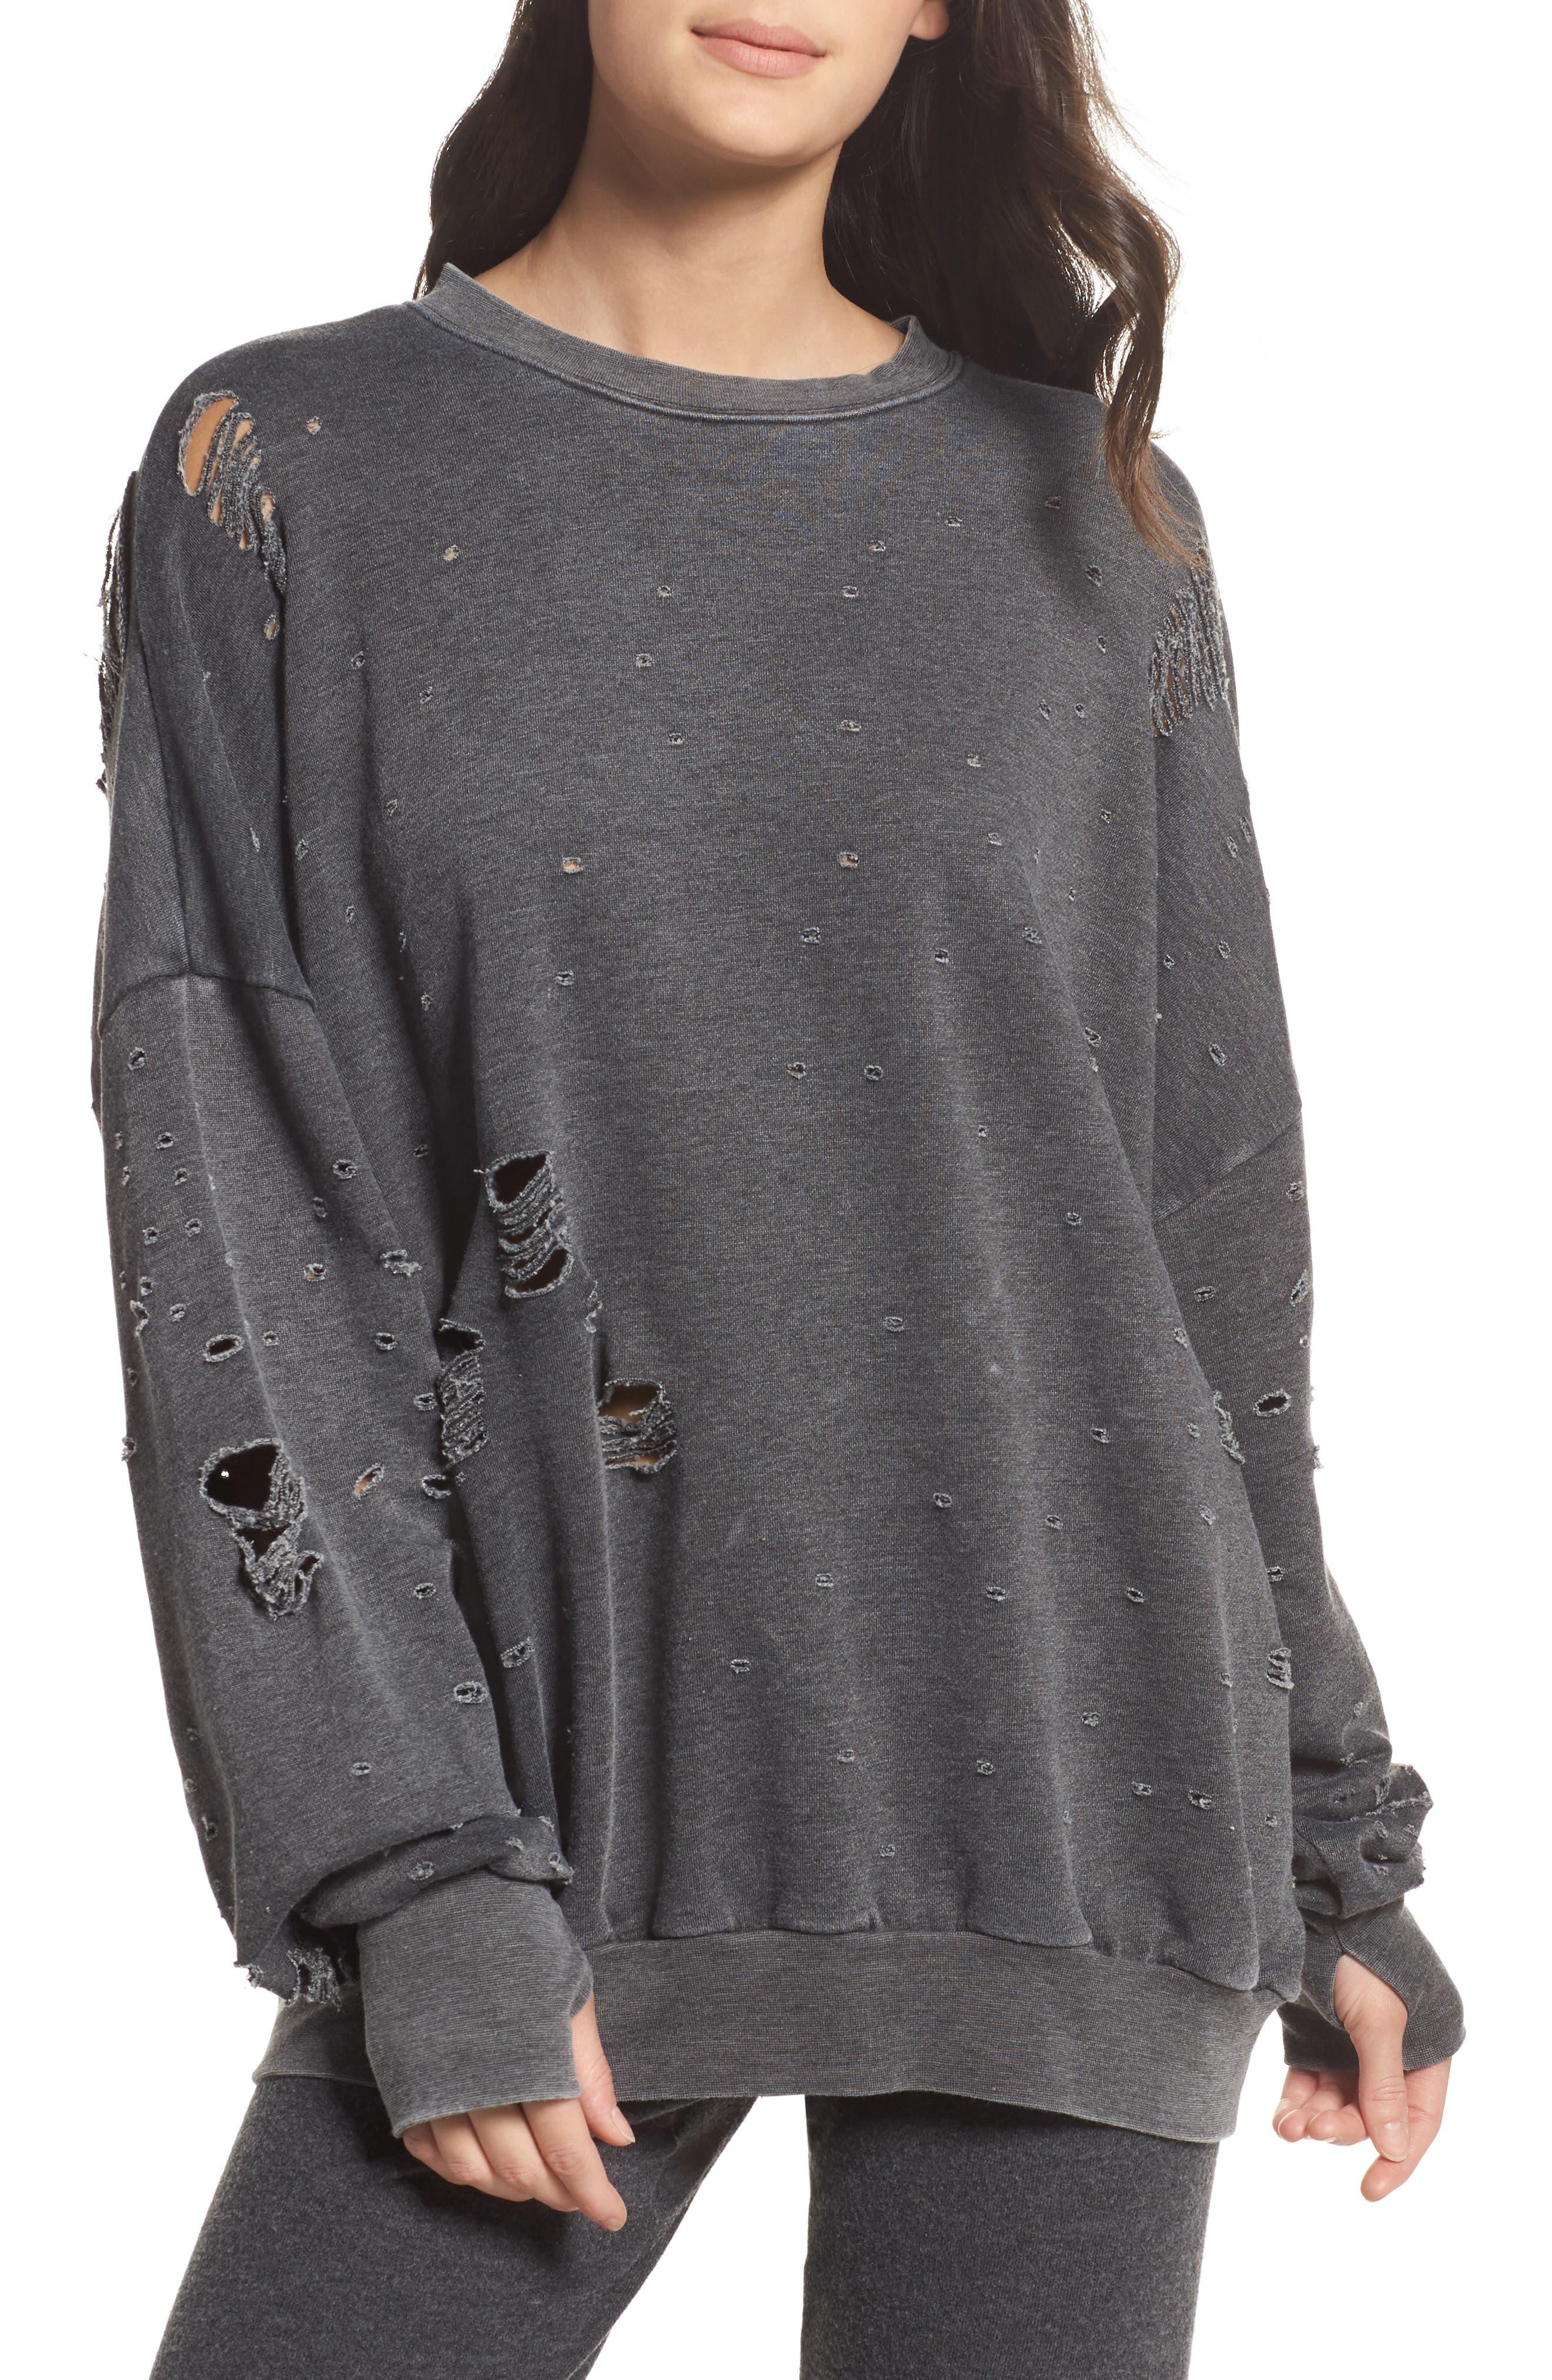 Thrasher Sweatshirt,                         Main,                         color, 020